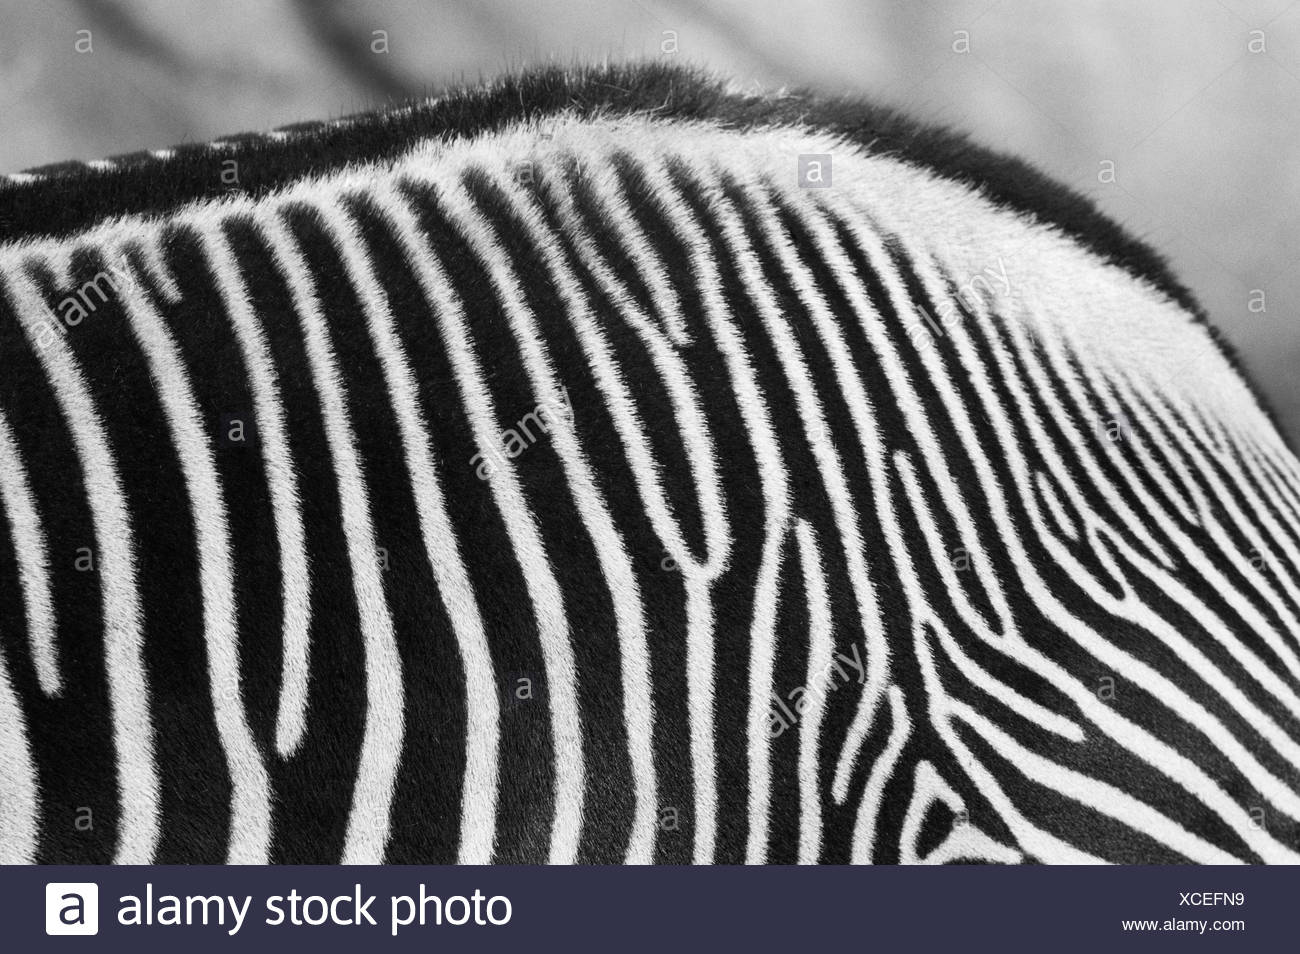 Zebra Photo Stock